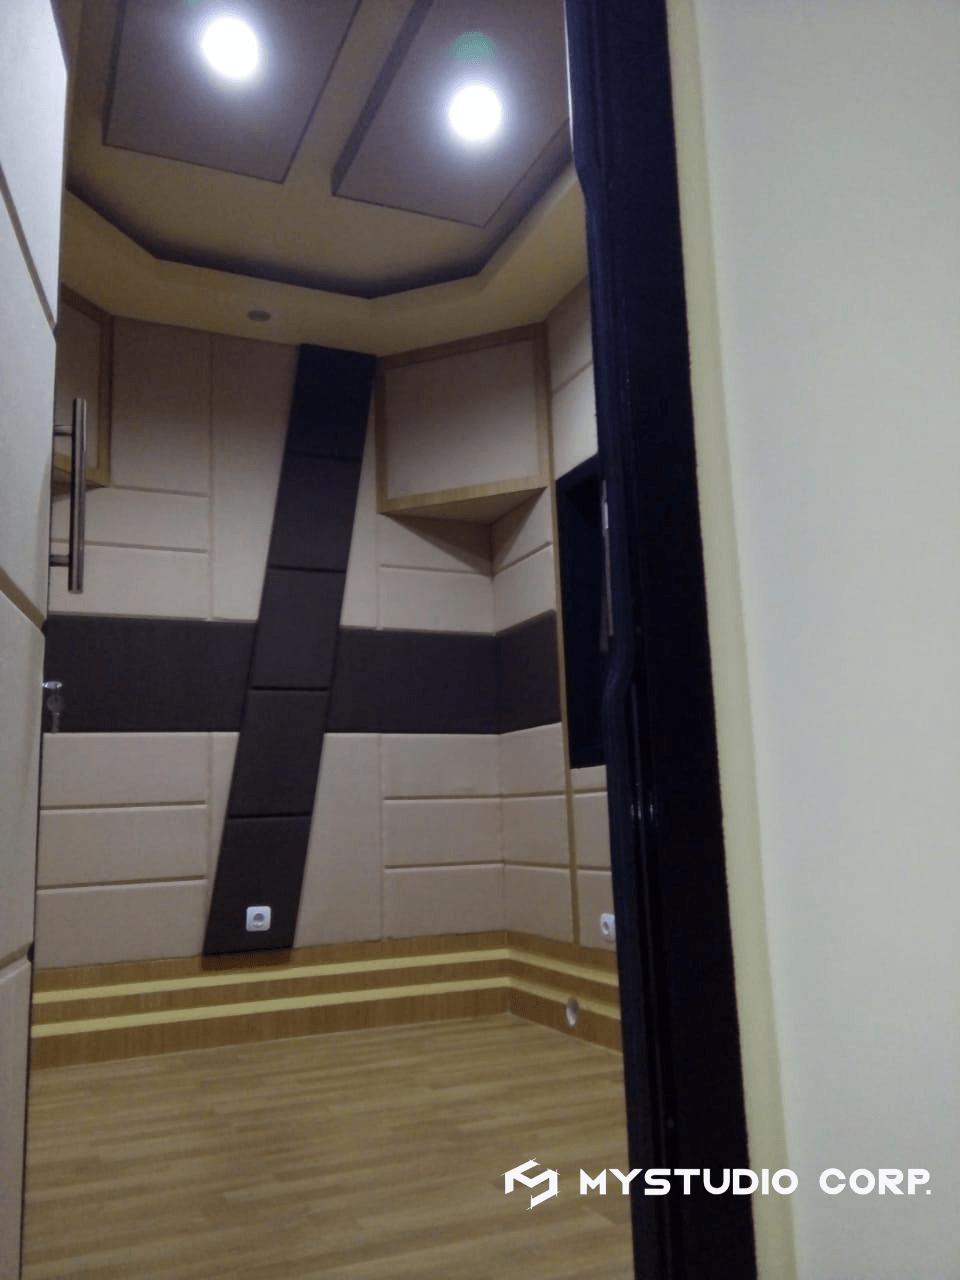 Mystudio.corp Studio Musik Cikarang Cikarang, Bekasi, Jawa Barat, Indonesia Cikarang, Bekasi, Jawa Barat, Indonesia Mystudiocorp-Studio-Musik-Cikarang  81512